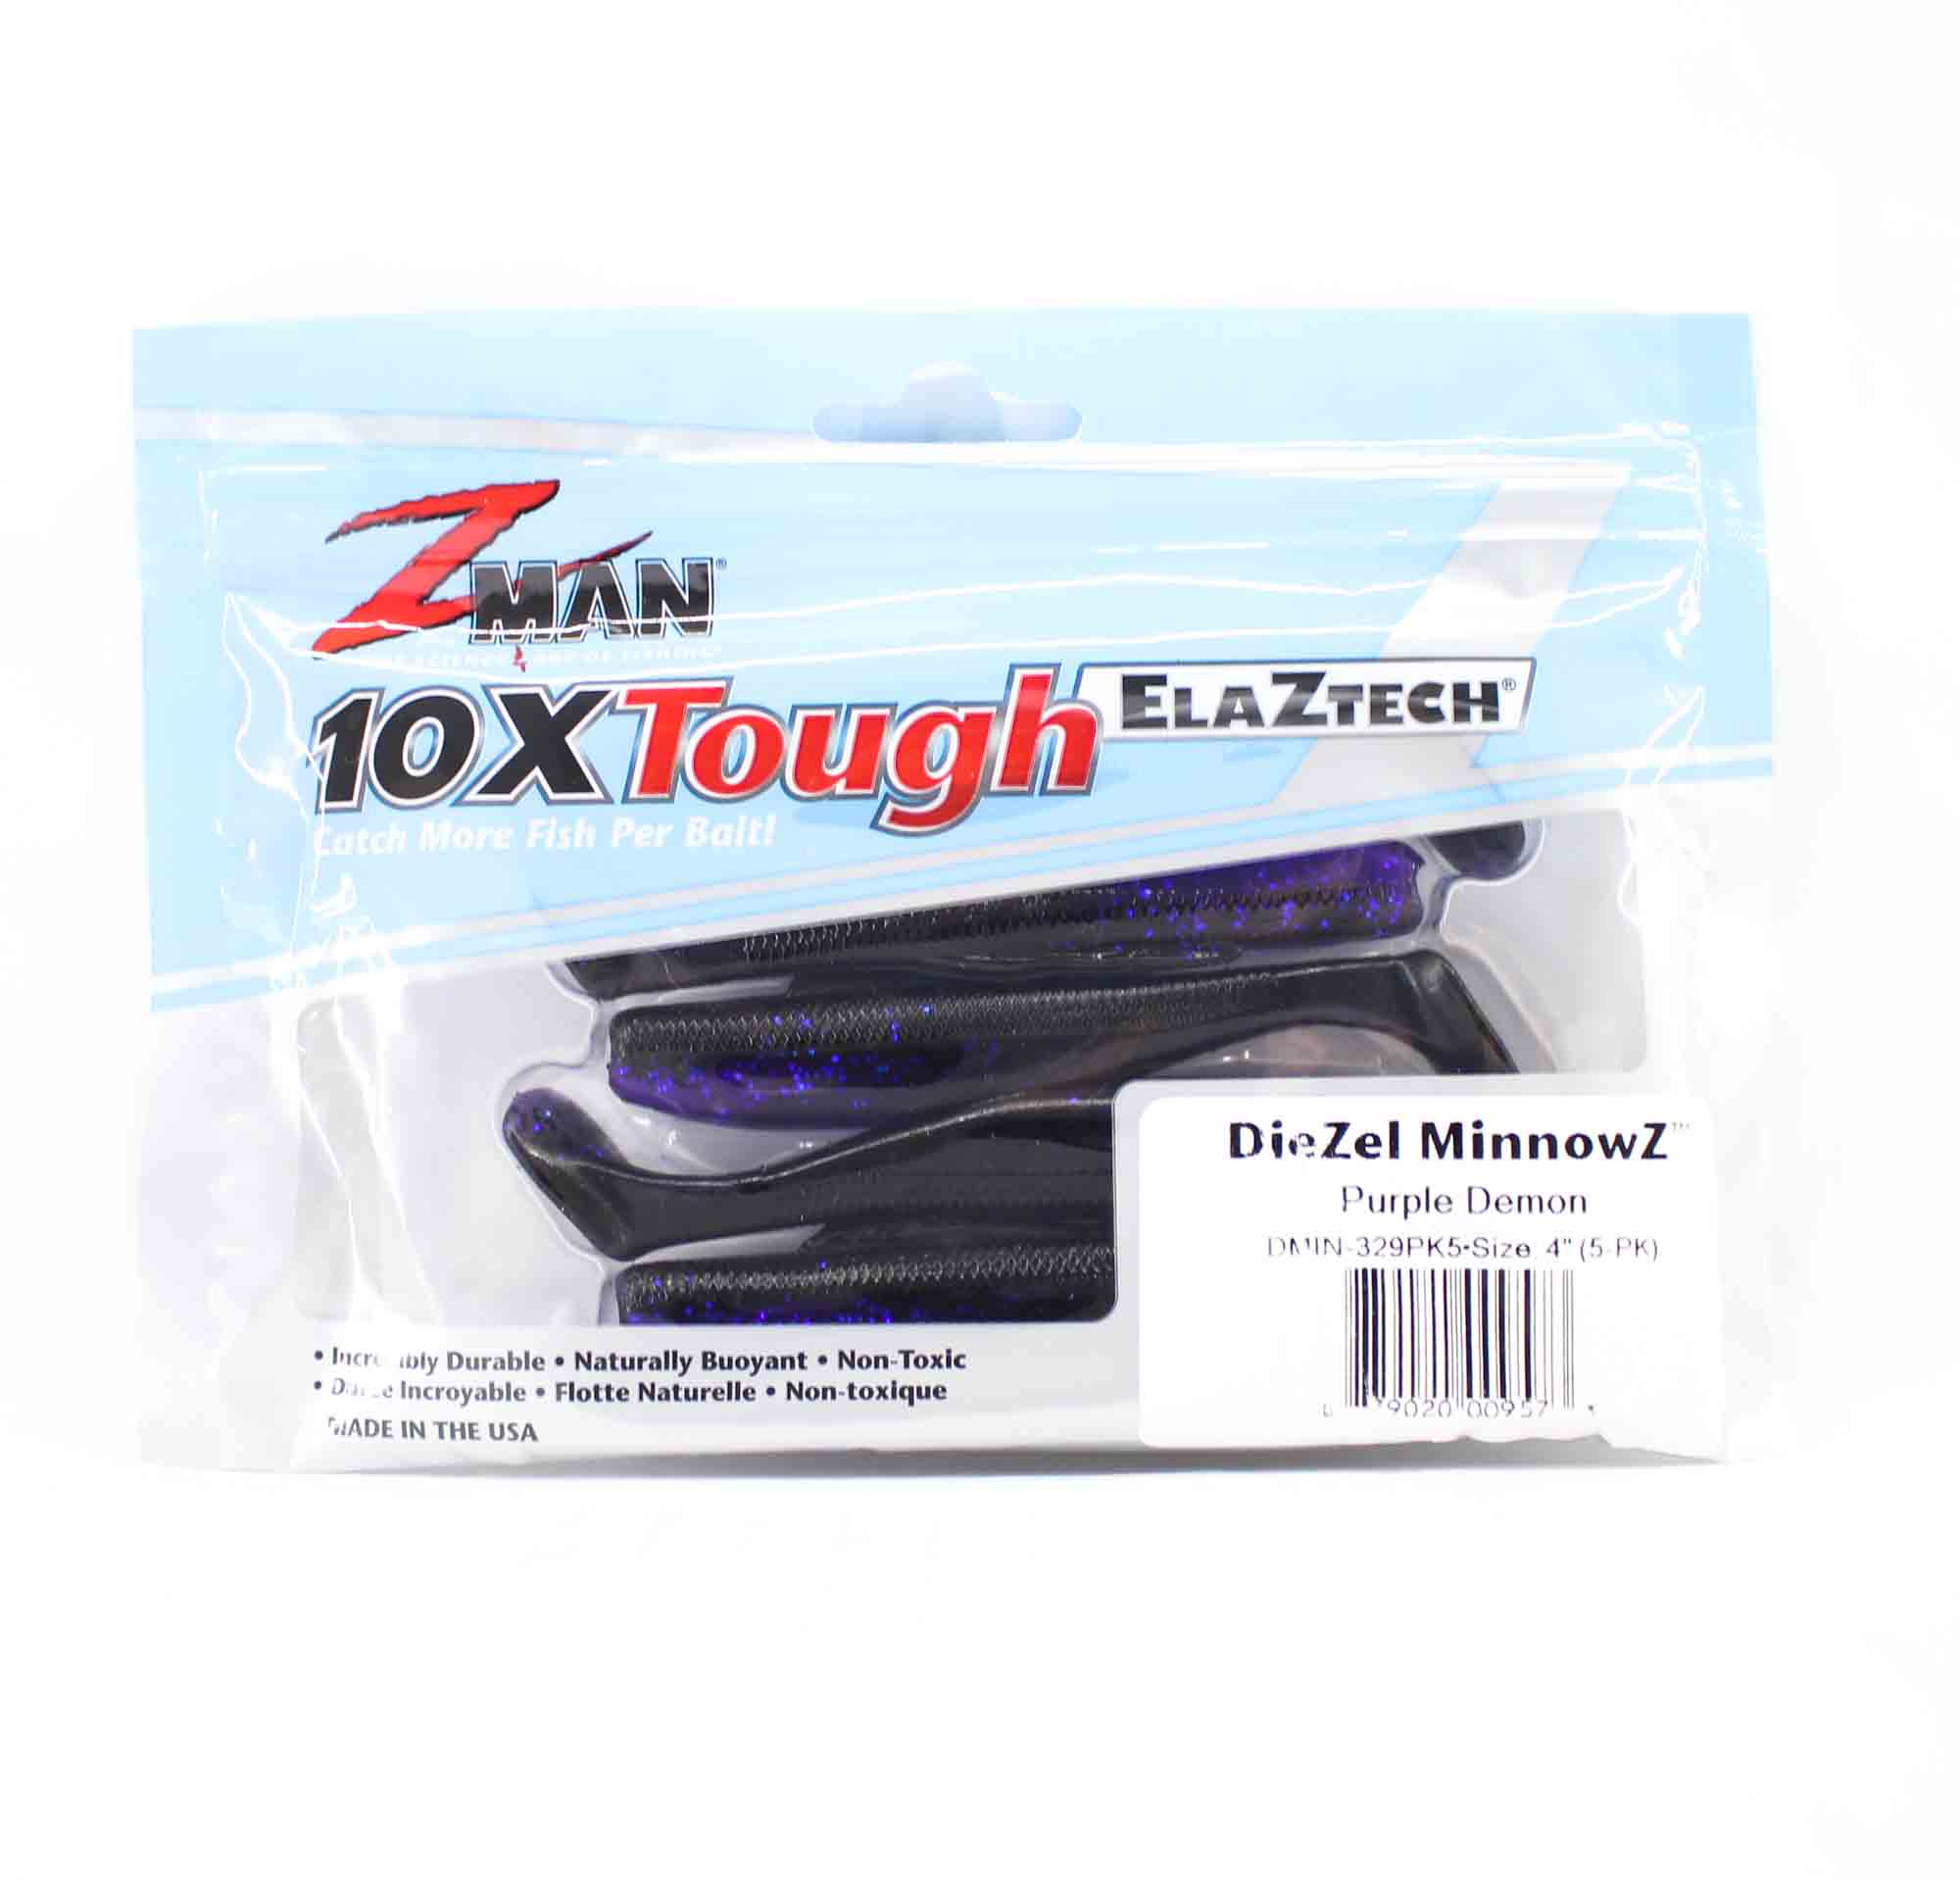 Zman Soft Lure Diezel MinnowZ 4 Inch 5 per pack Purple Demon (9573)